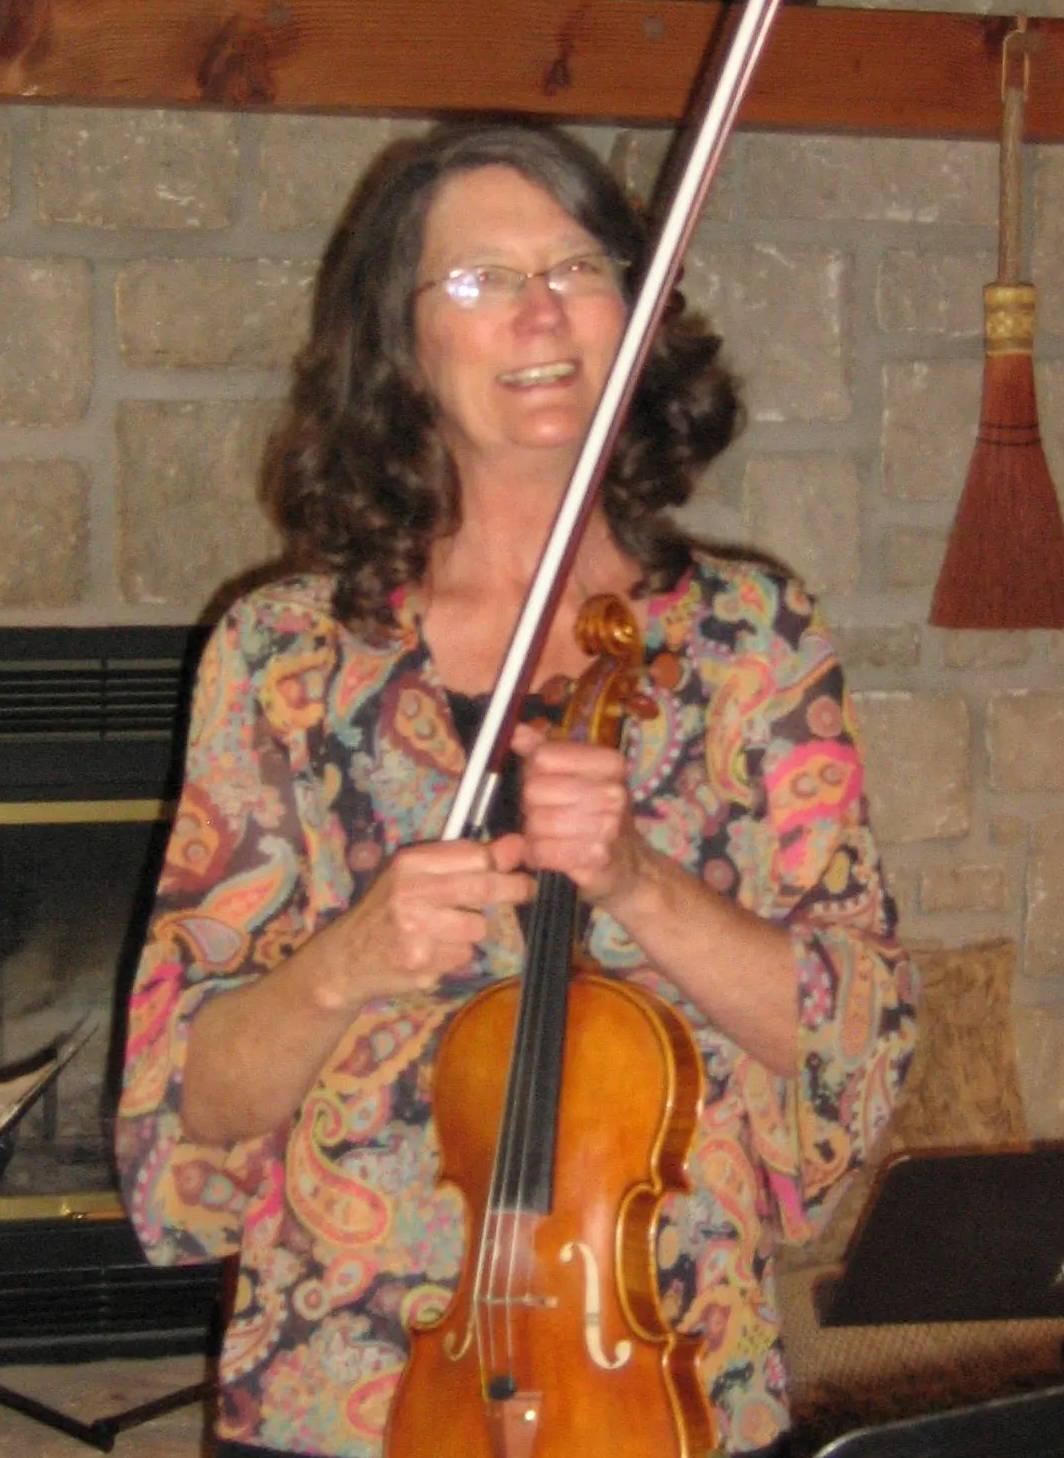 Picture of Susan Fuller holding her violin